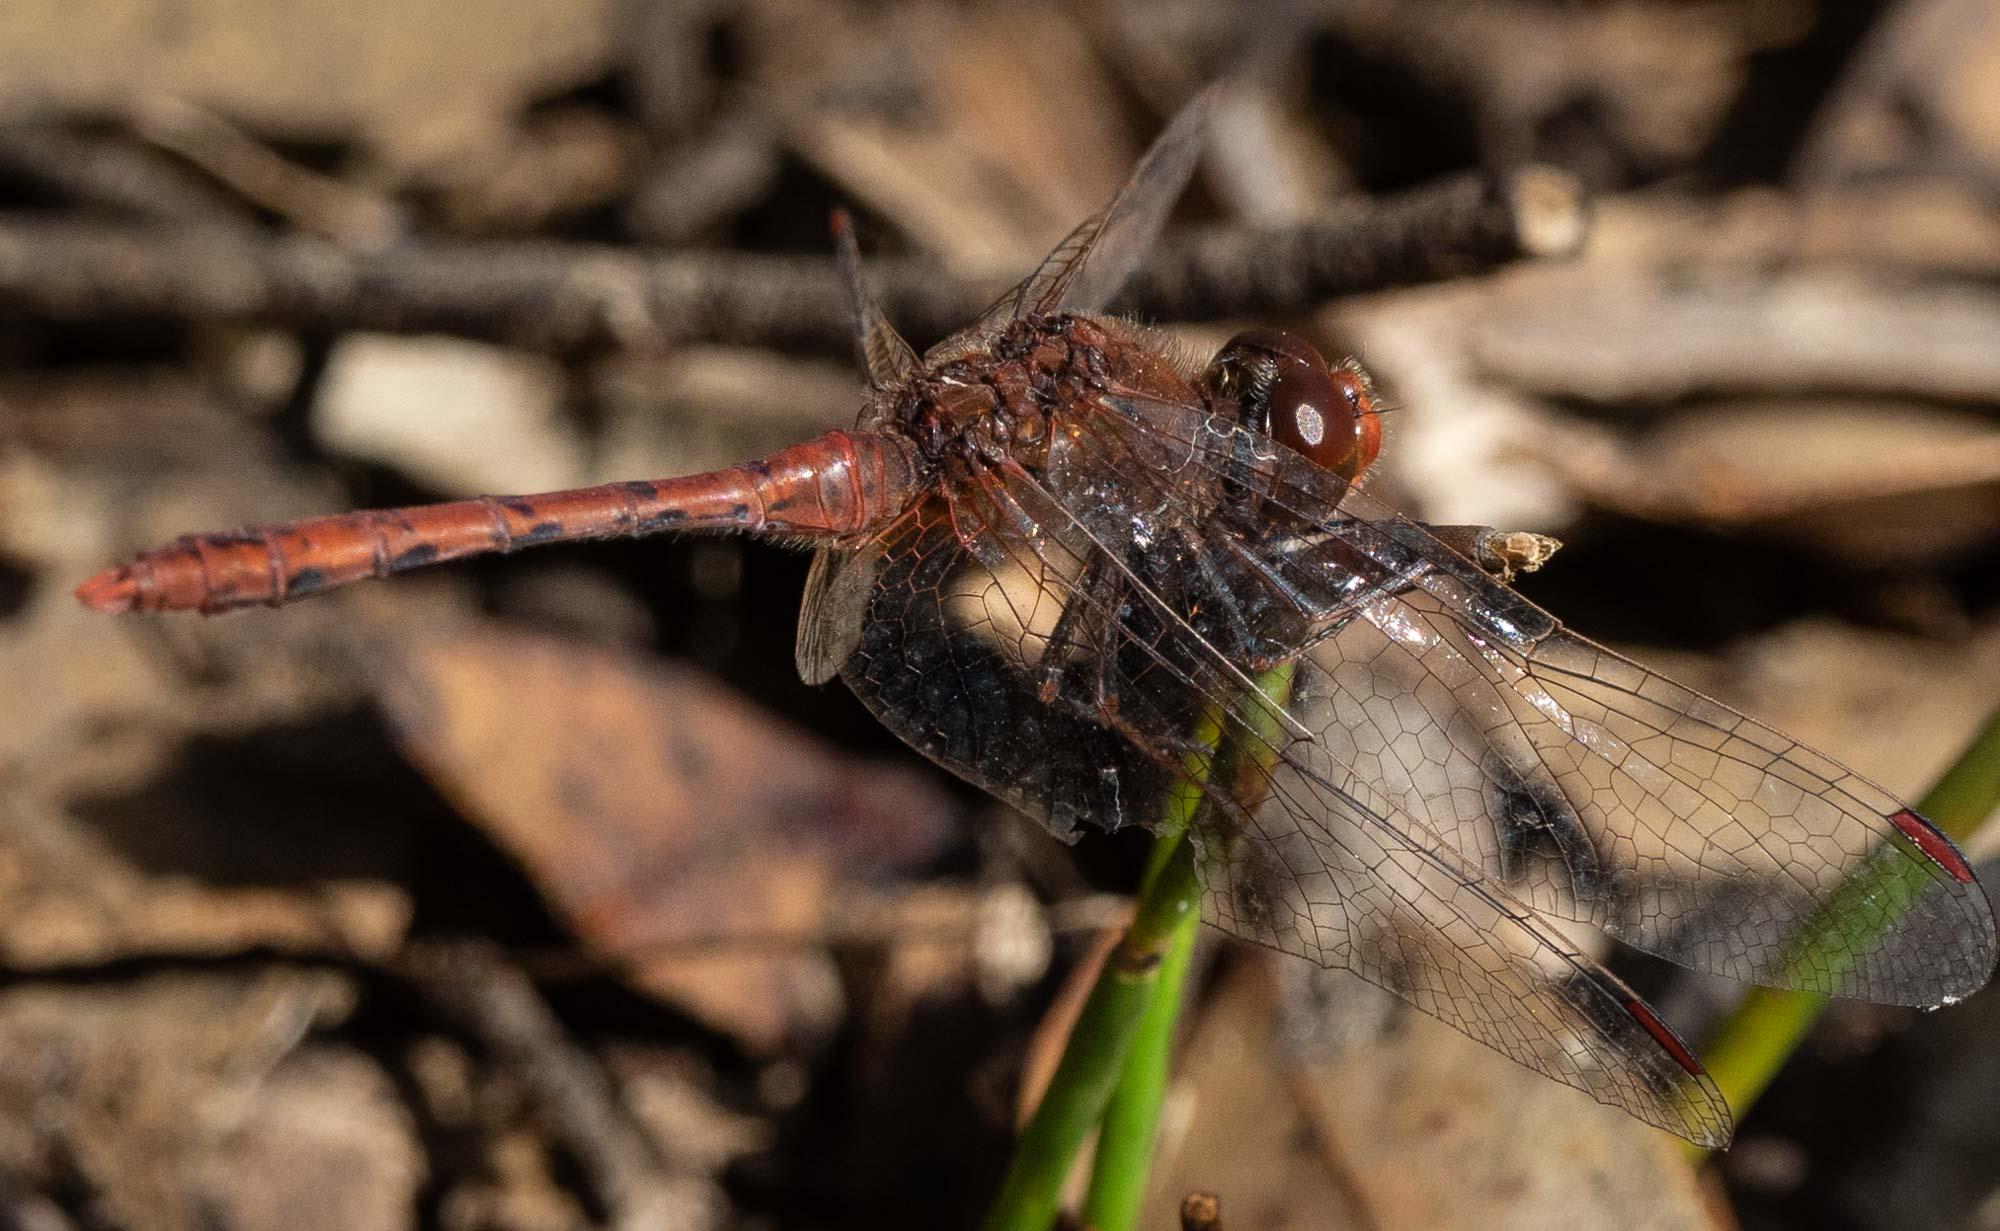 Wandering Percher - a widespread dragonfly